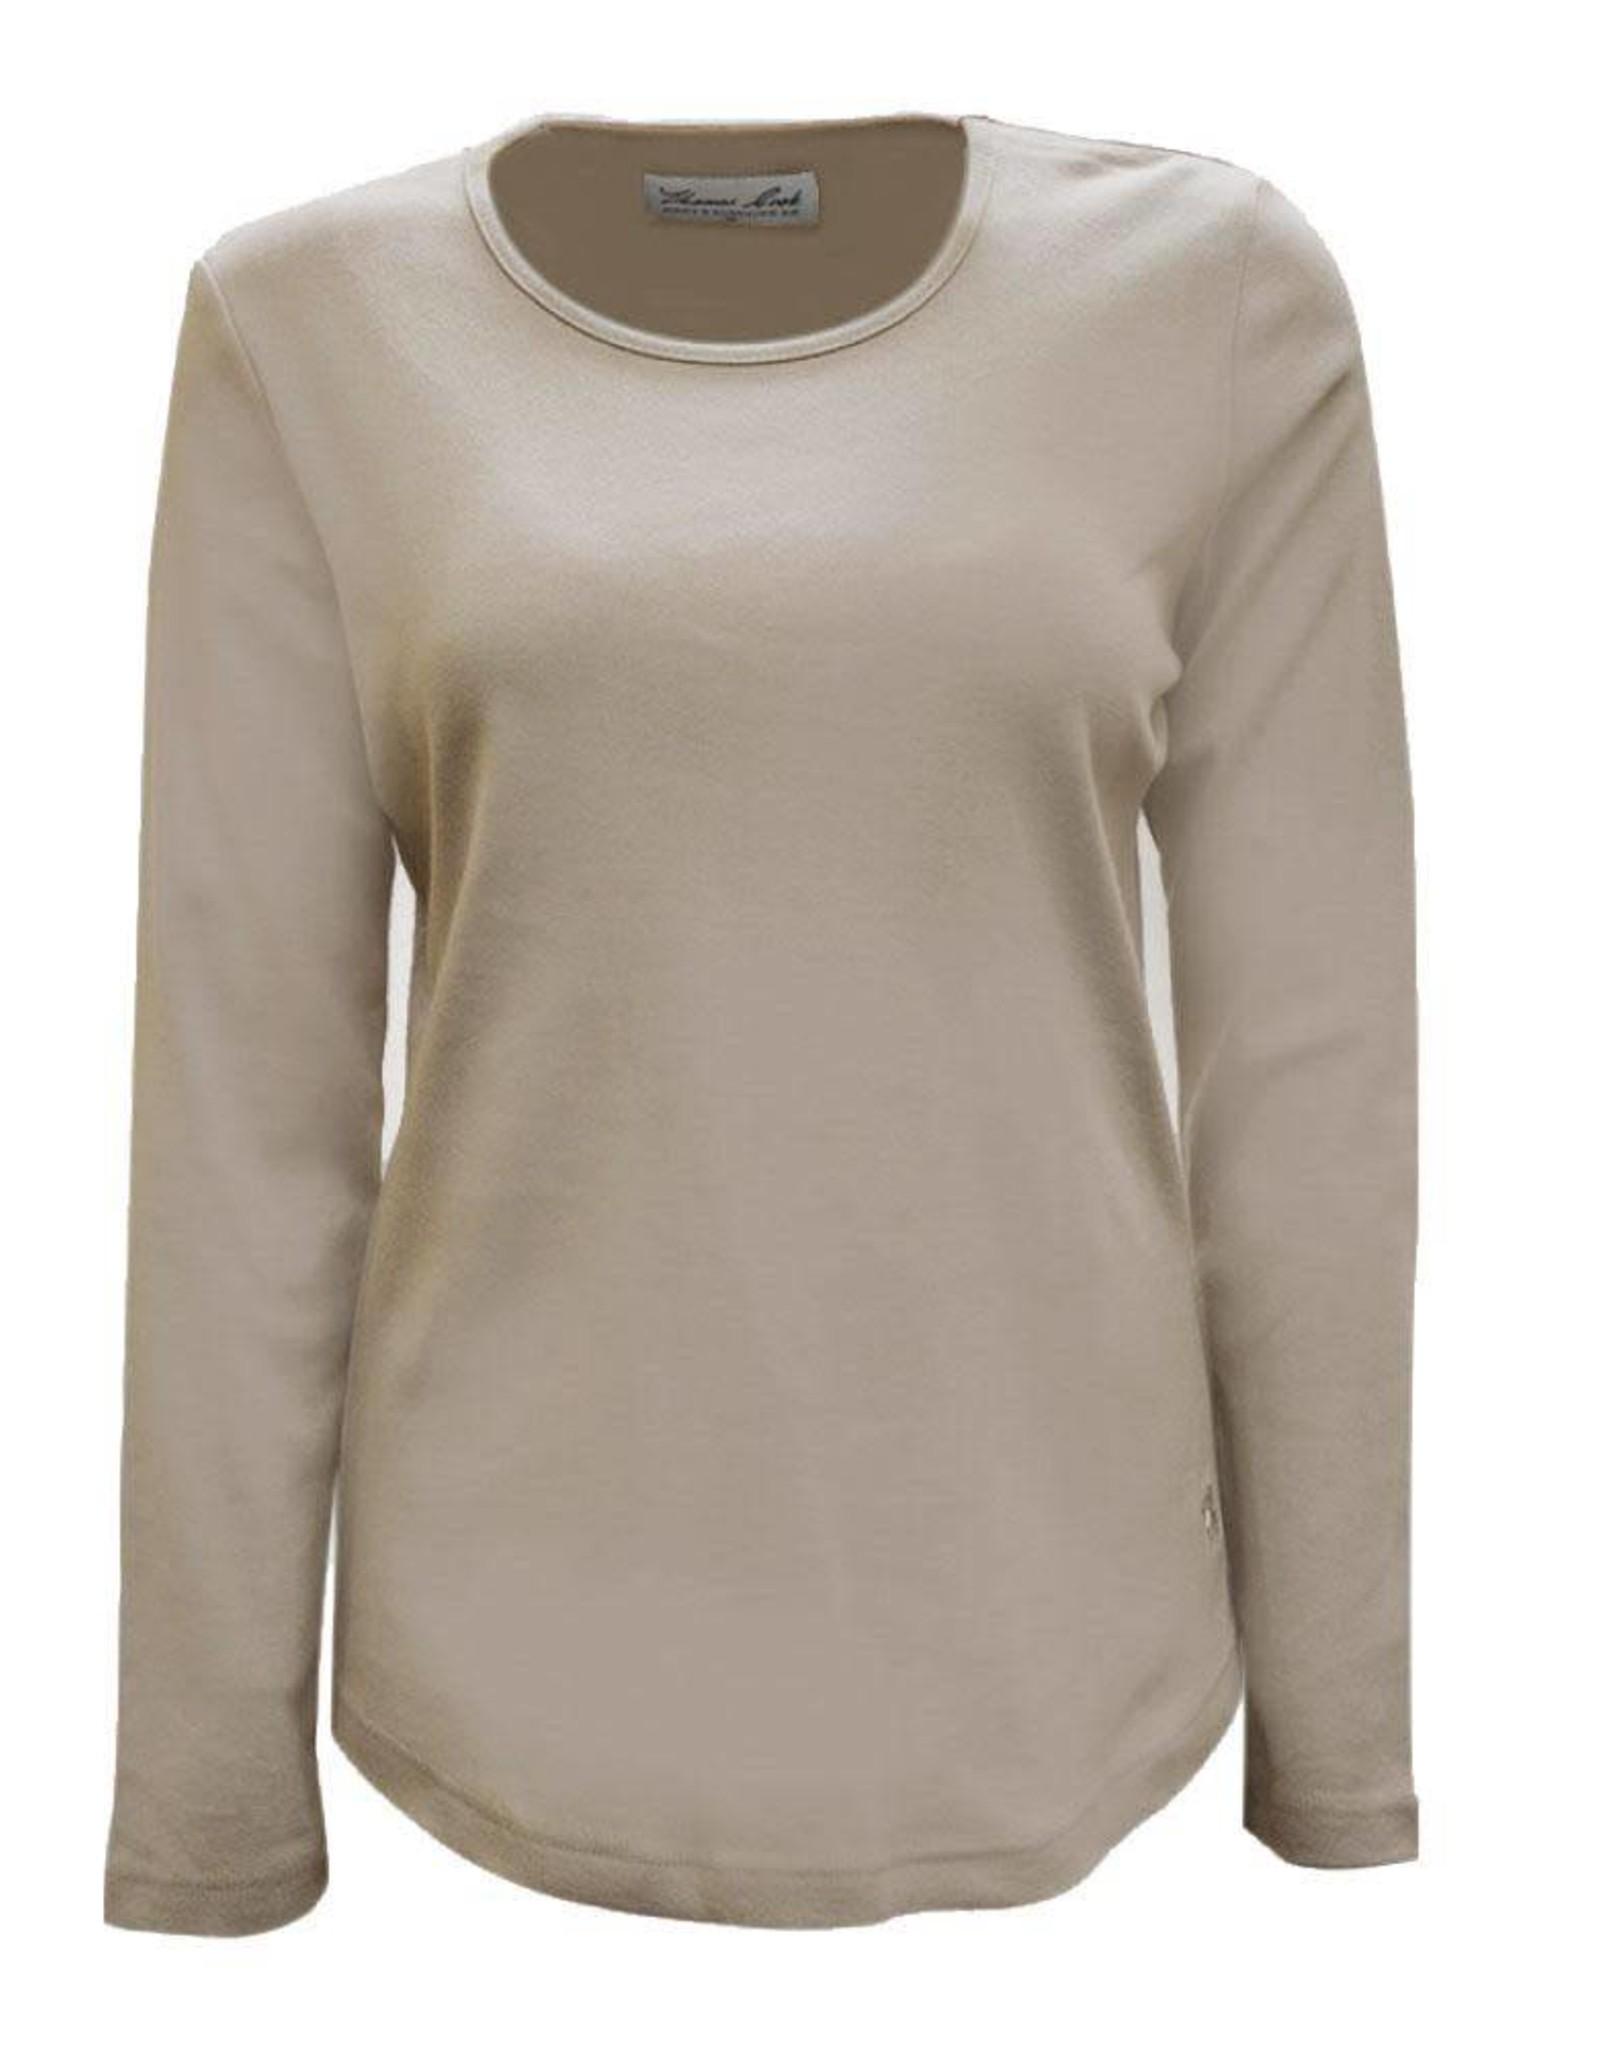 Thomas Cook Thomas Cook Womens Curved Hem Long Sleeve  Shirt -  Pebble - Size 10